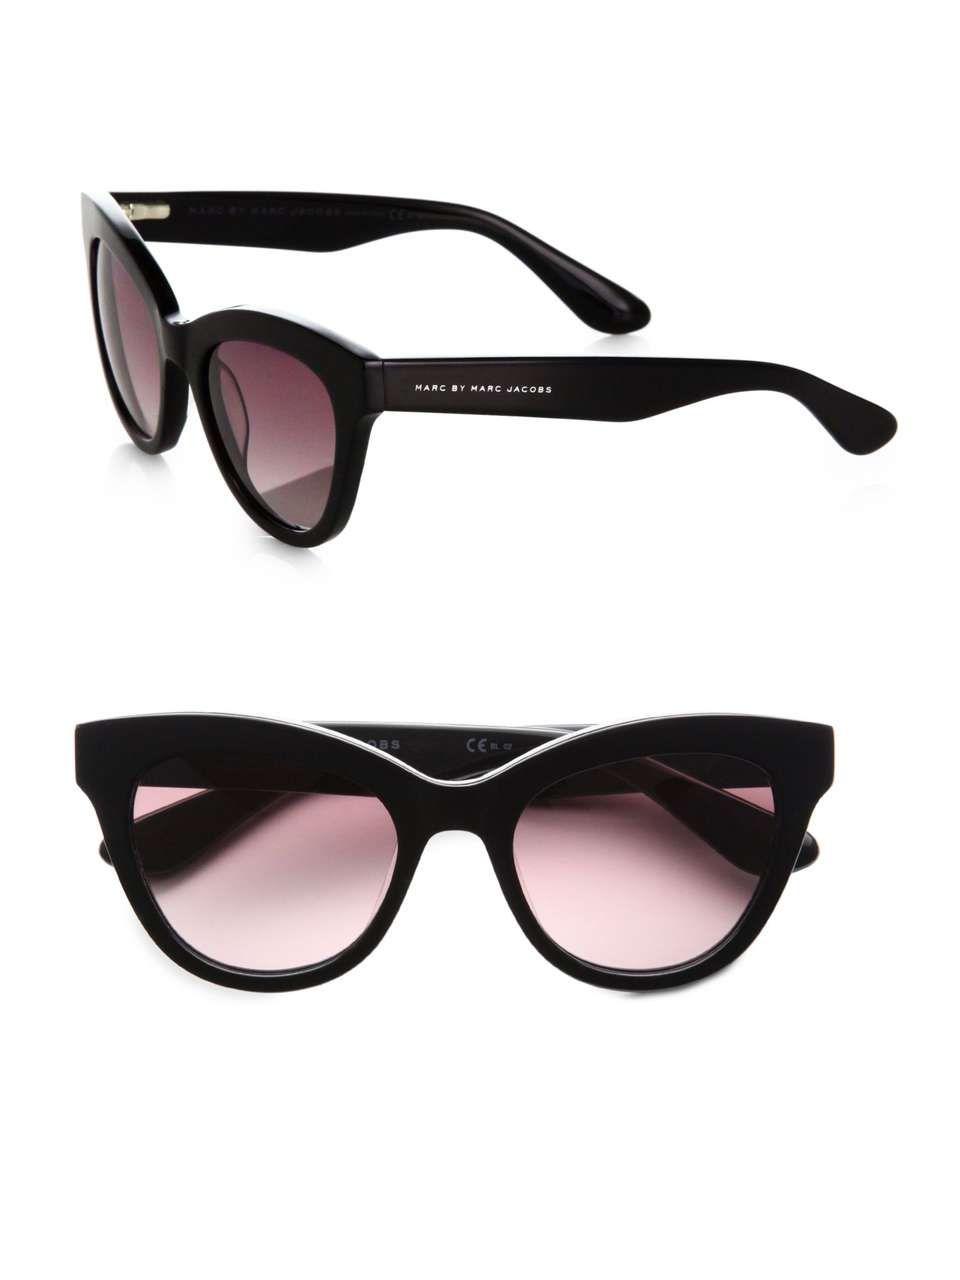 Épinglé sur Lululovely's sunglasses